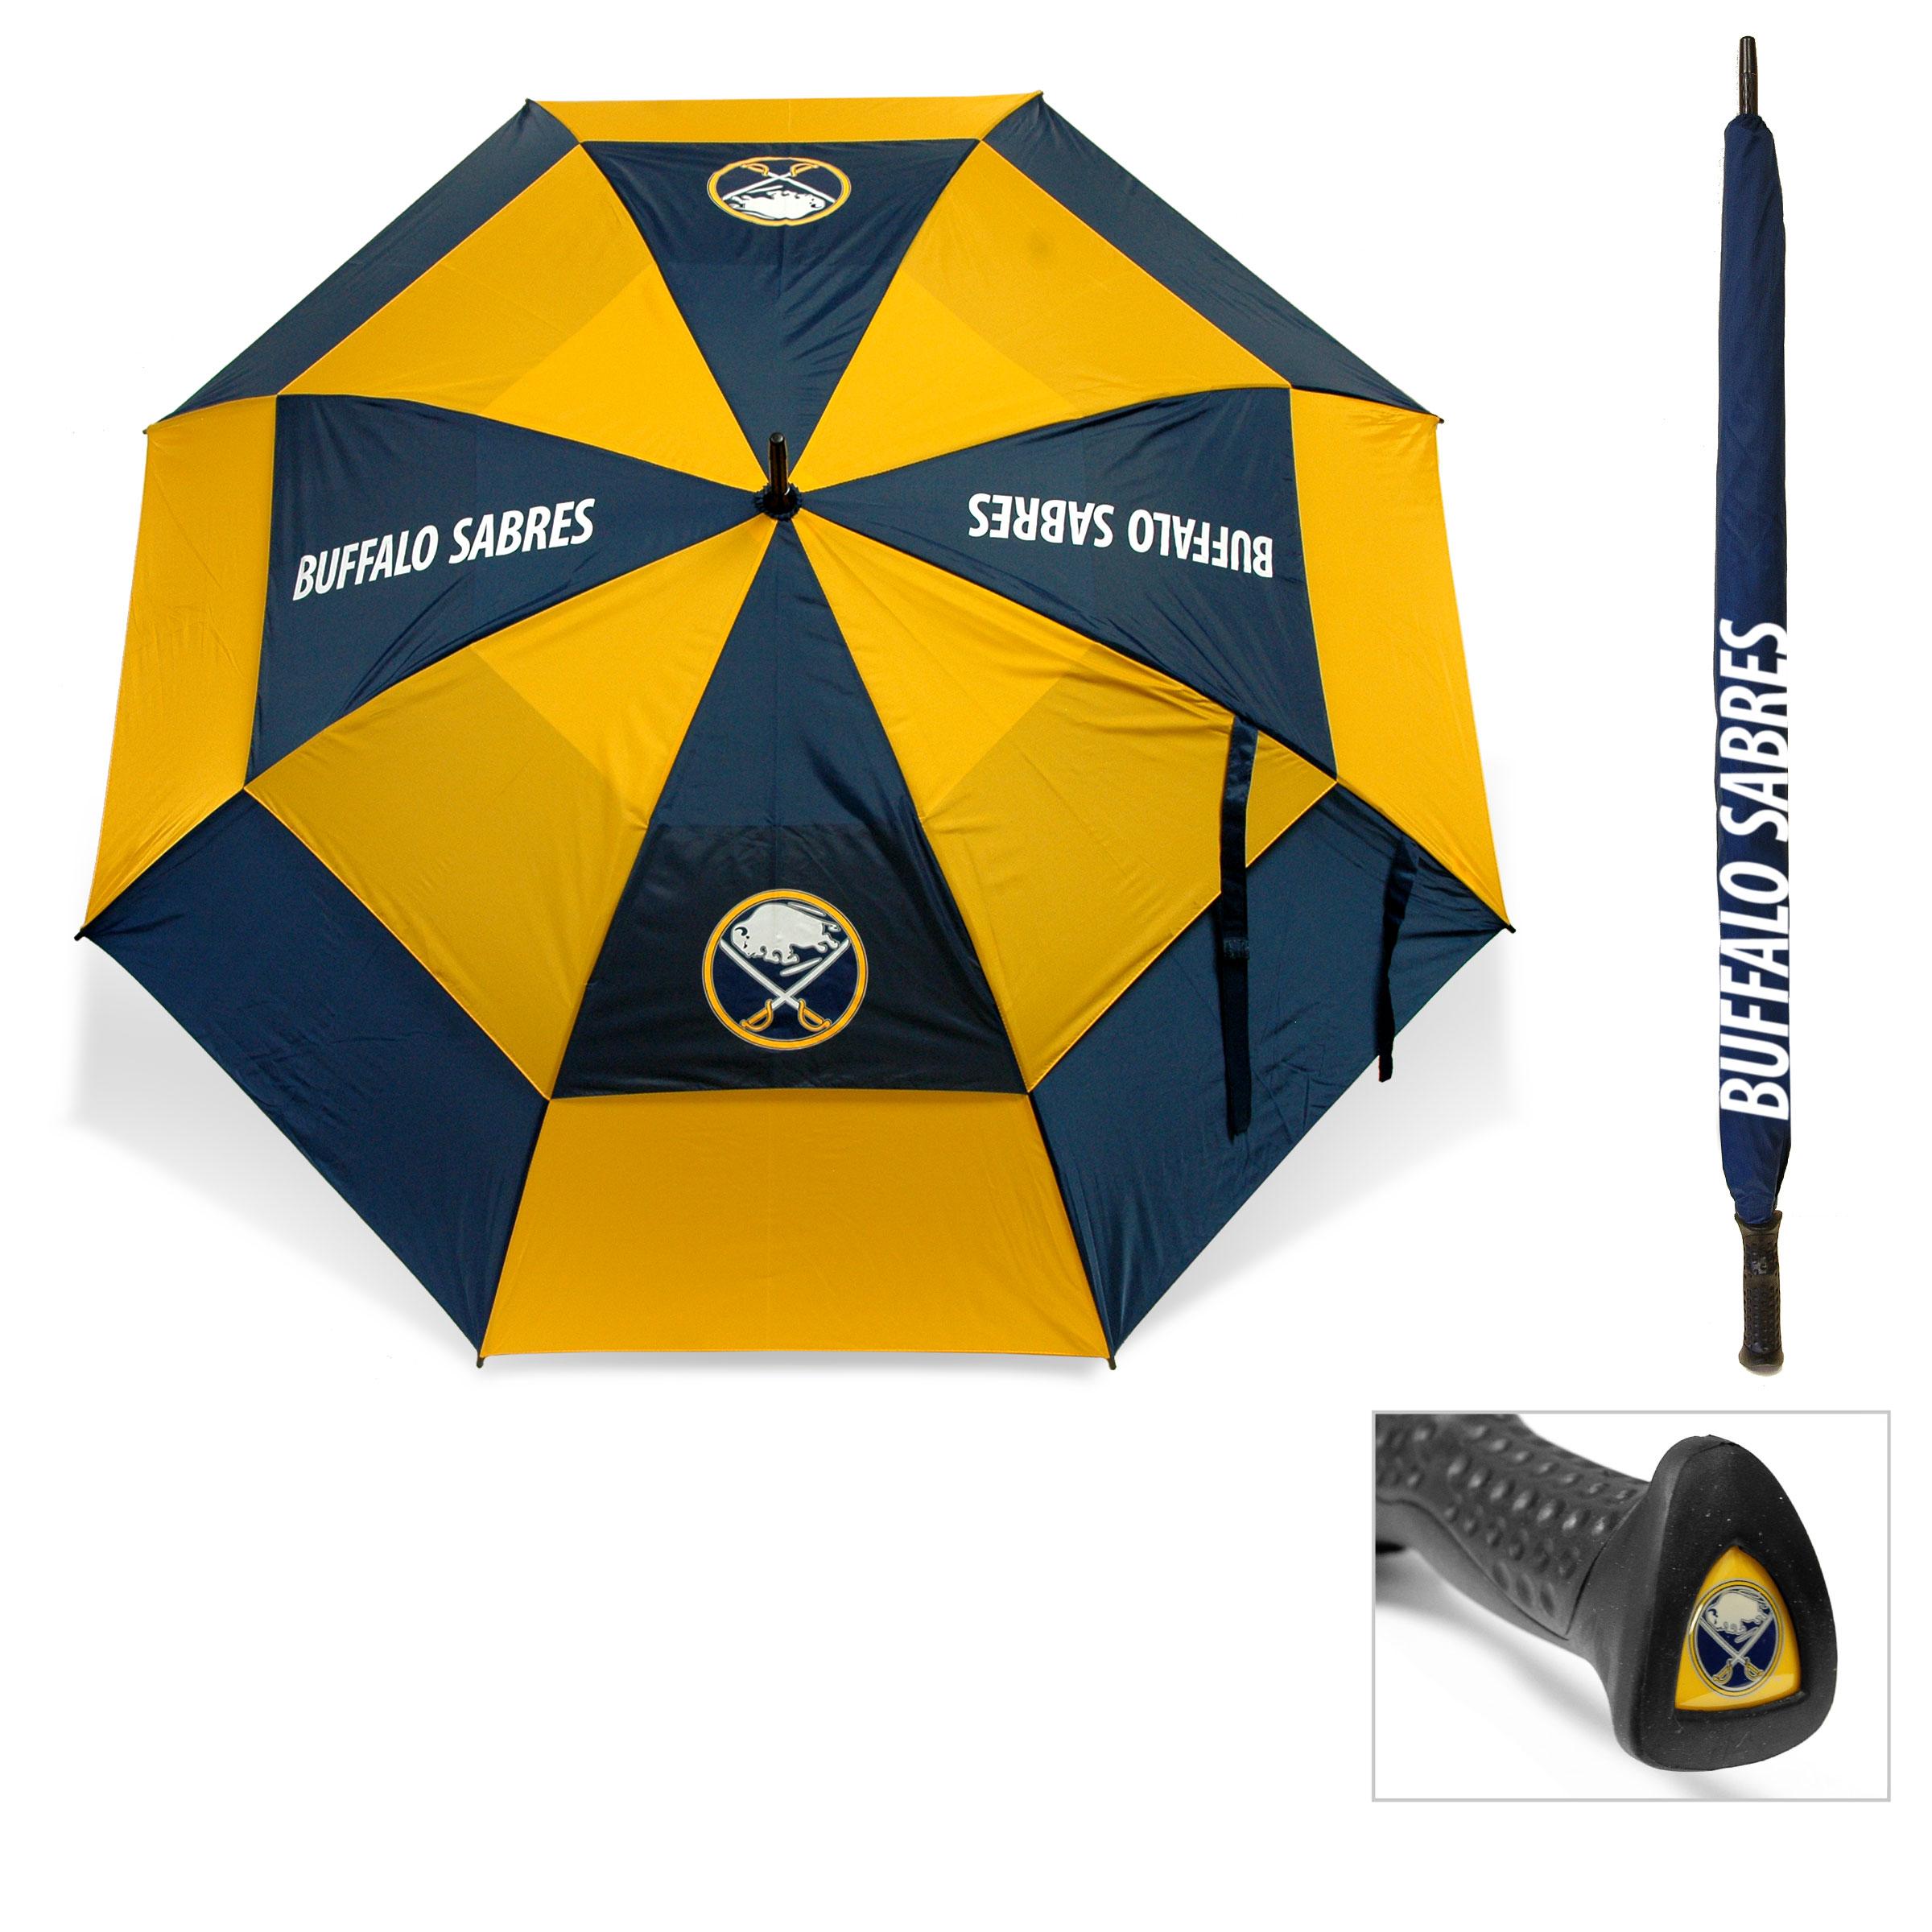 Buffalo Sabres Official NHL Umbrella by Team Golf 13269